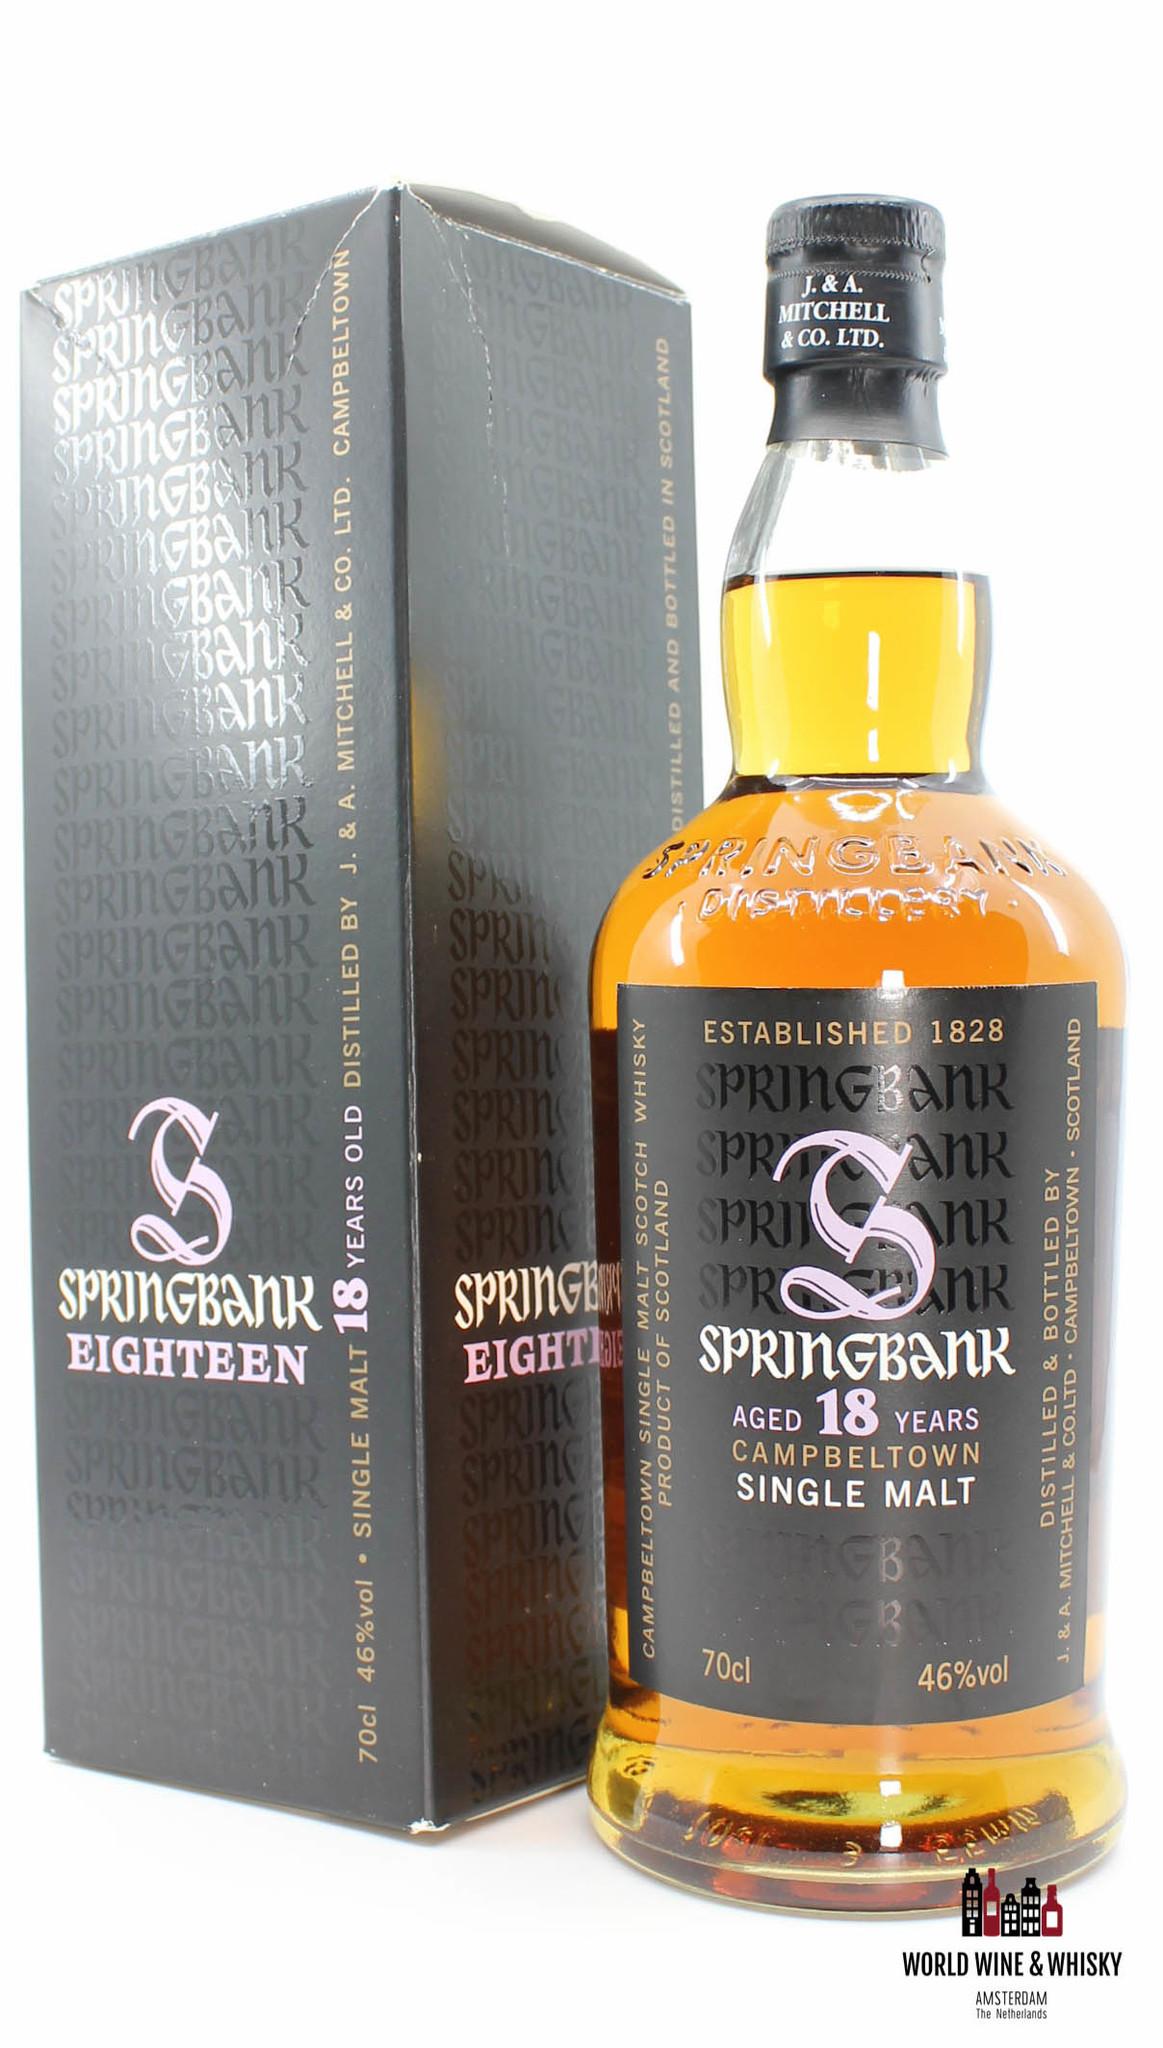 Springbank Springbank 18 Years Old 2010 - Purple Big S - 46% (one of 9000 bottles)